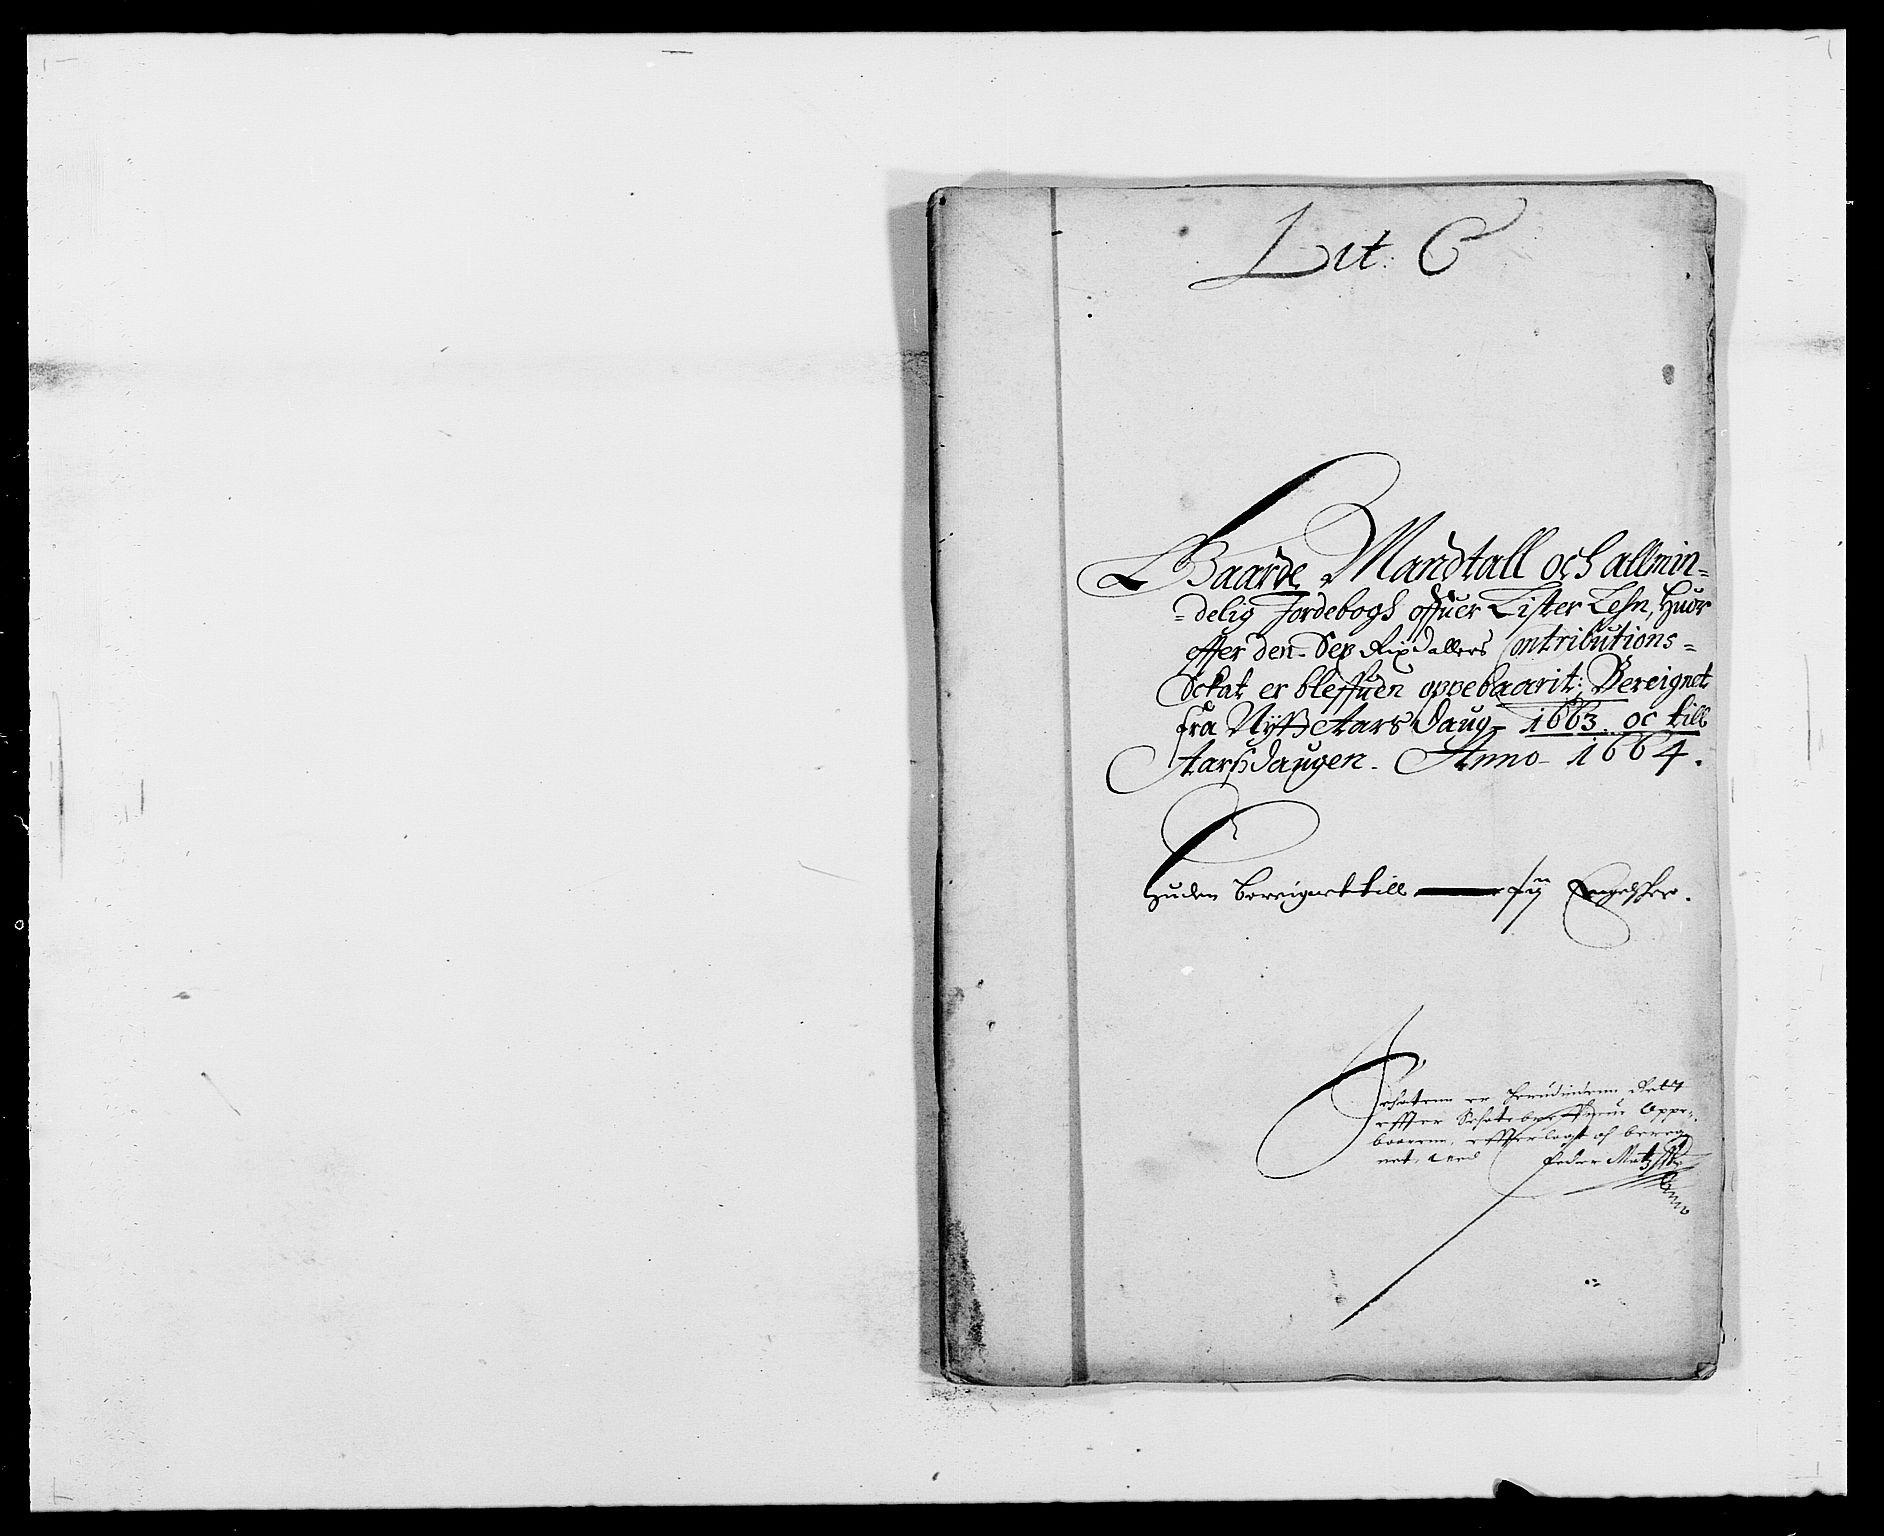 RA, Rentekammeret inntil 1814, Reviderte regnskaper, Fogderegnskap, R41/L2523: Fogderegnskap Lista, 1663-1664, s. 21